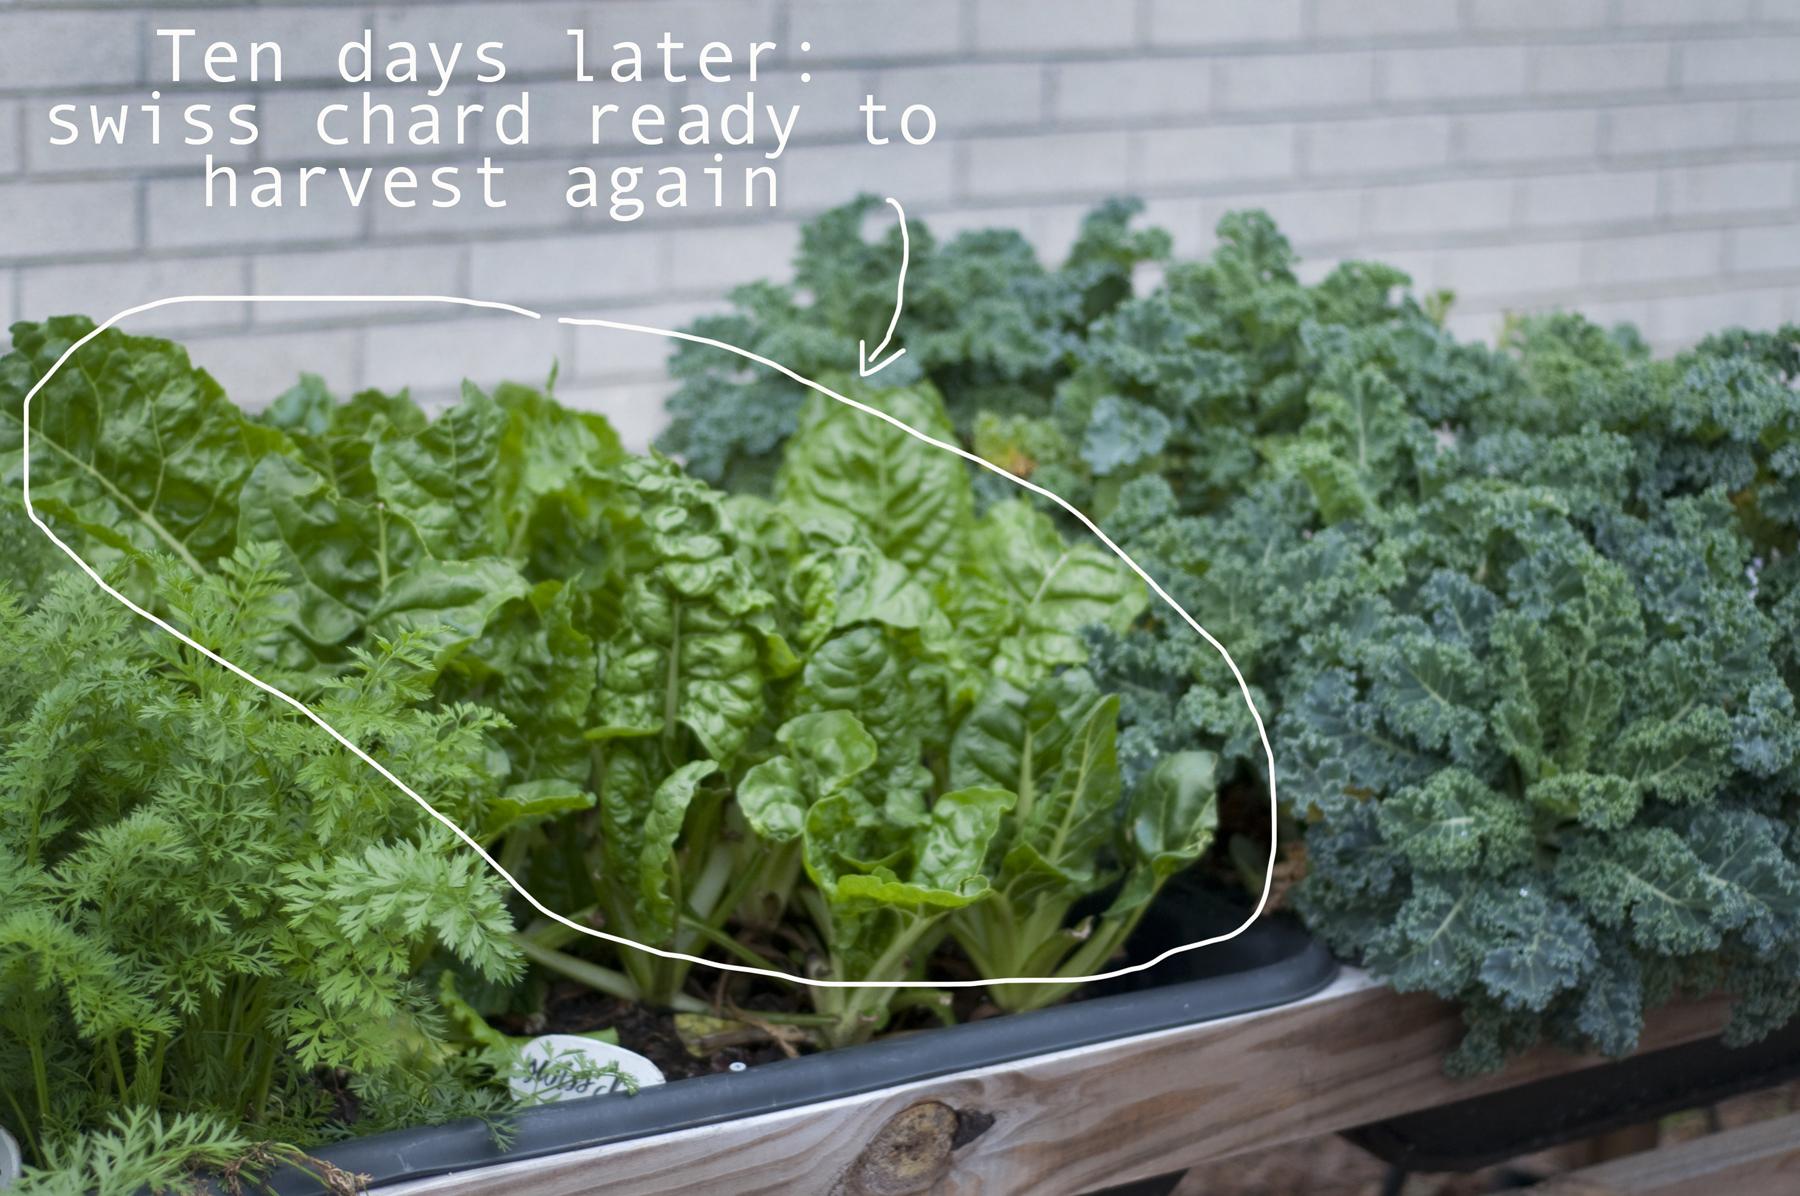 Swiss chard: harvest, wait ten days, repeat...